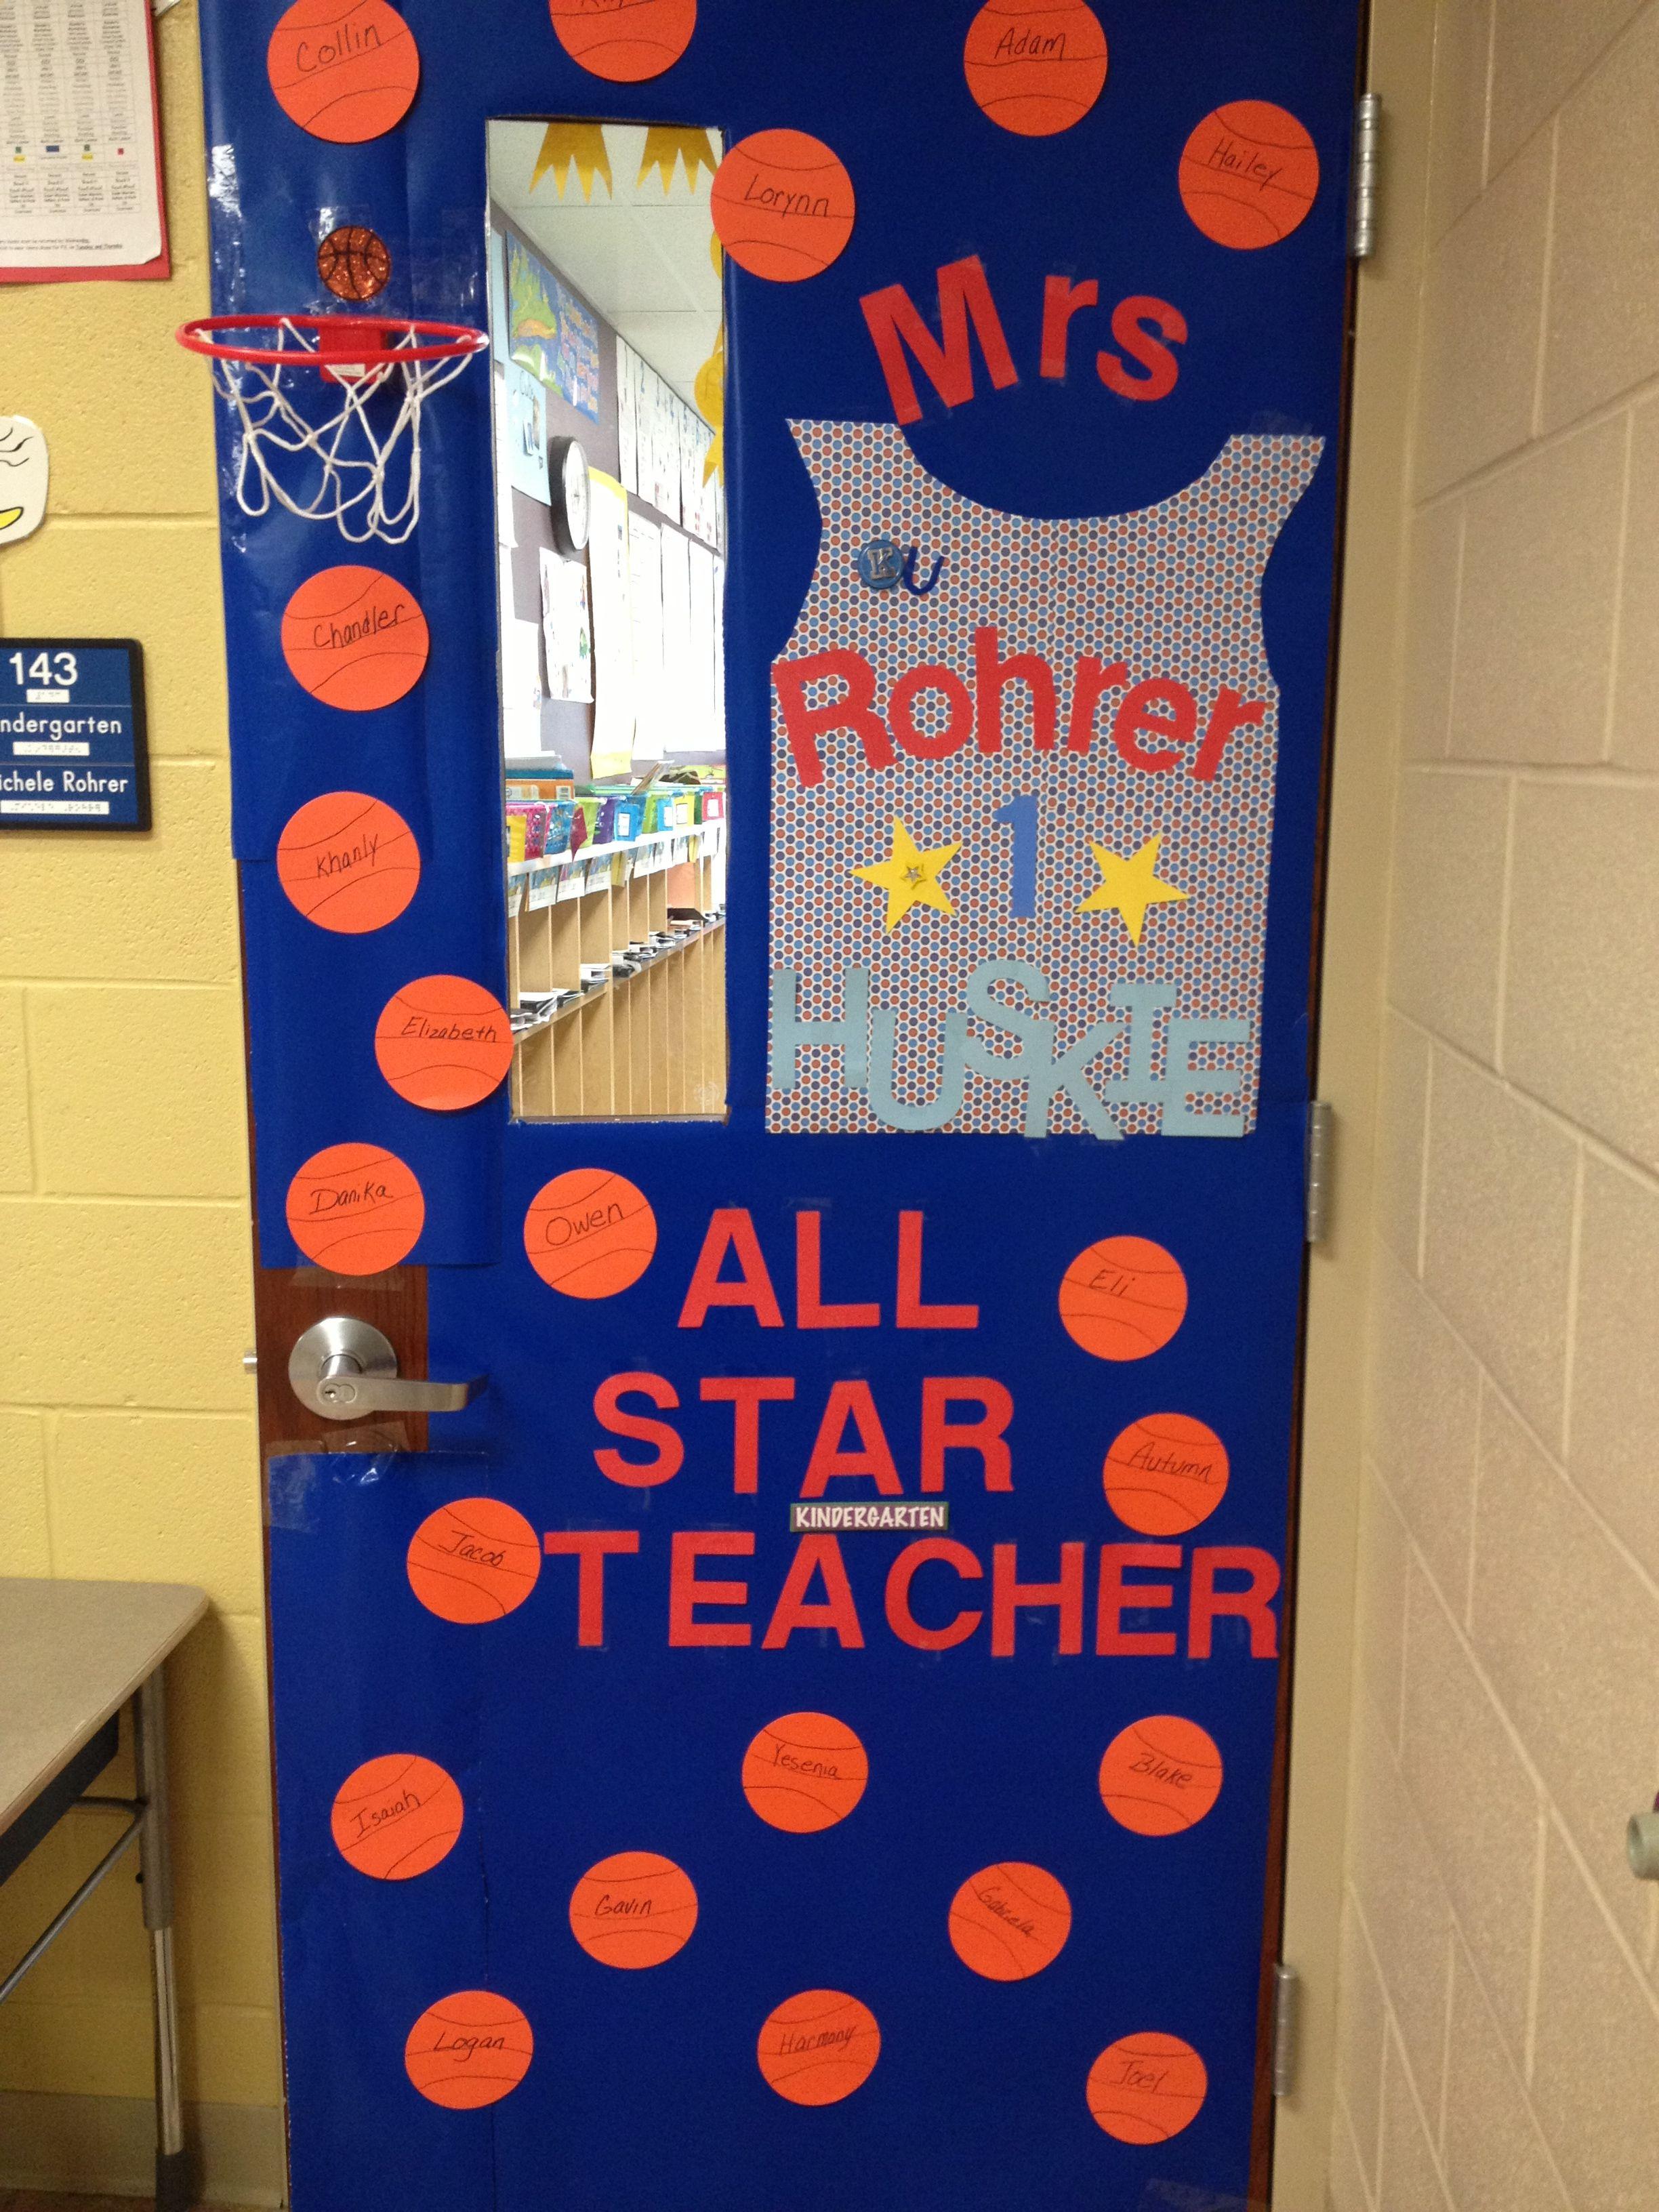 Teacher appreciation door I did for Mrs. Rohrer Owens K teacher! With the help from Haley! & Teacher appreciation door I did for Mrs. Rohrer Owens K teacher ...